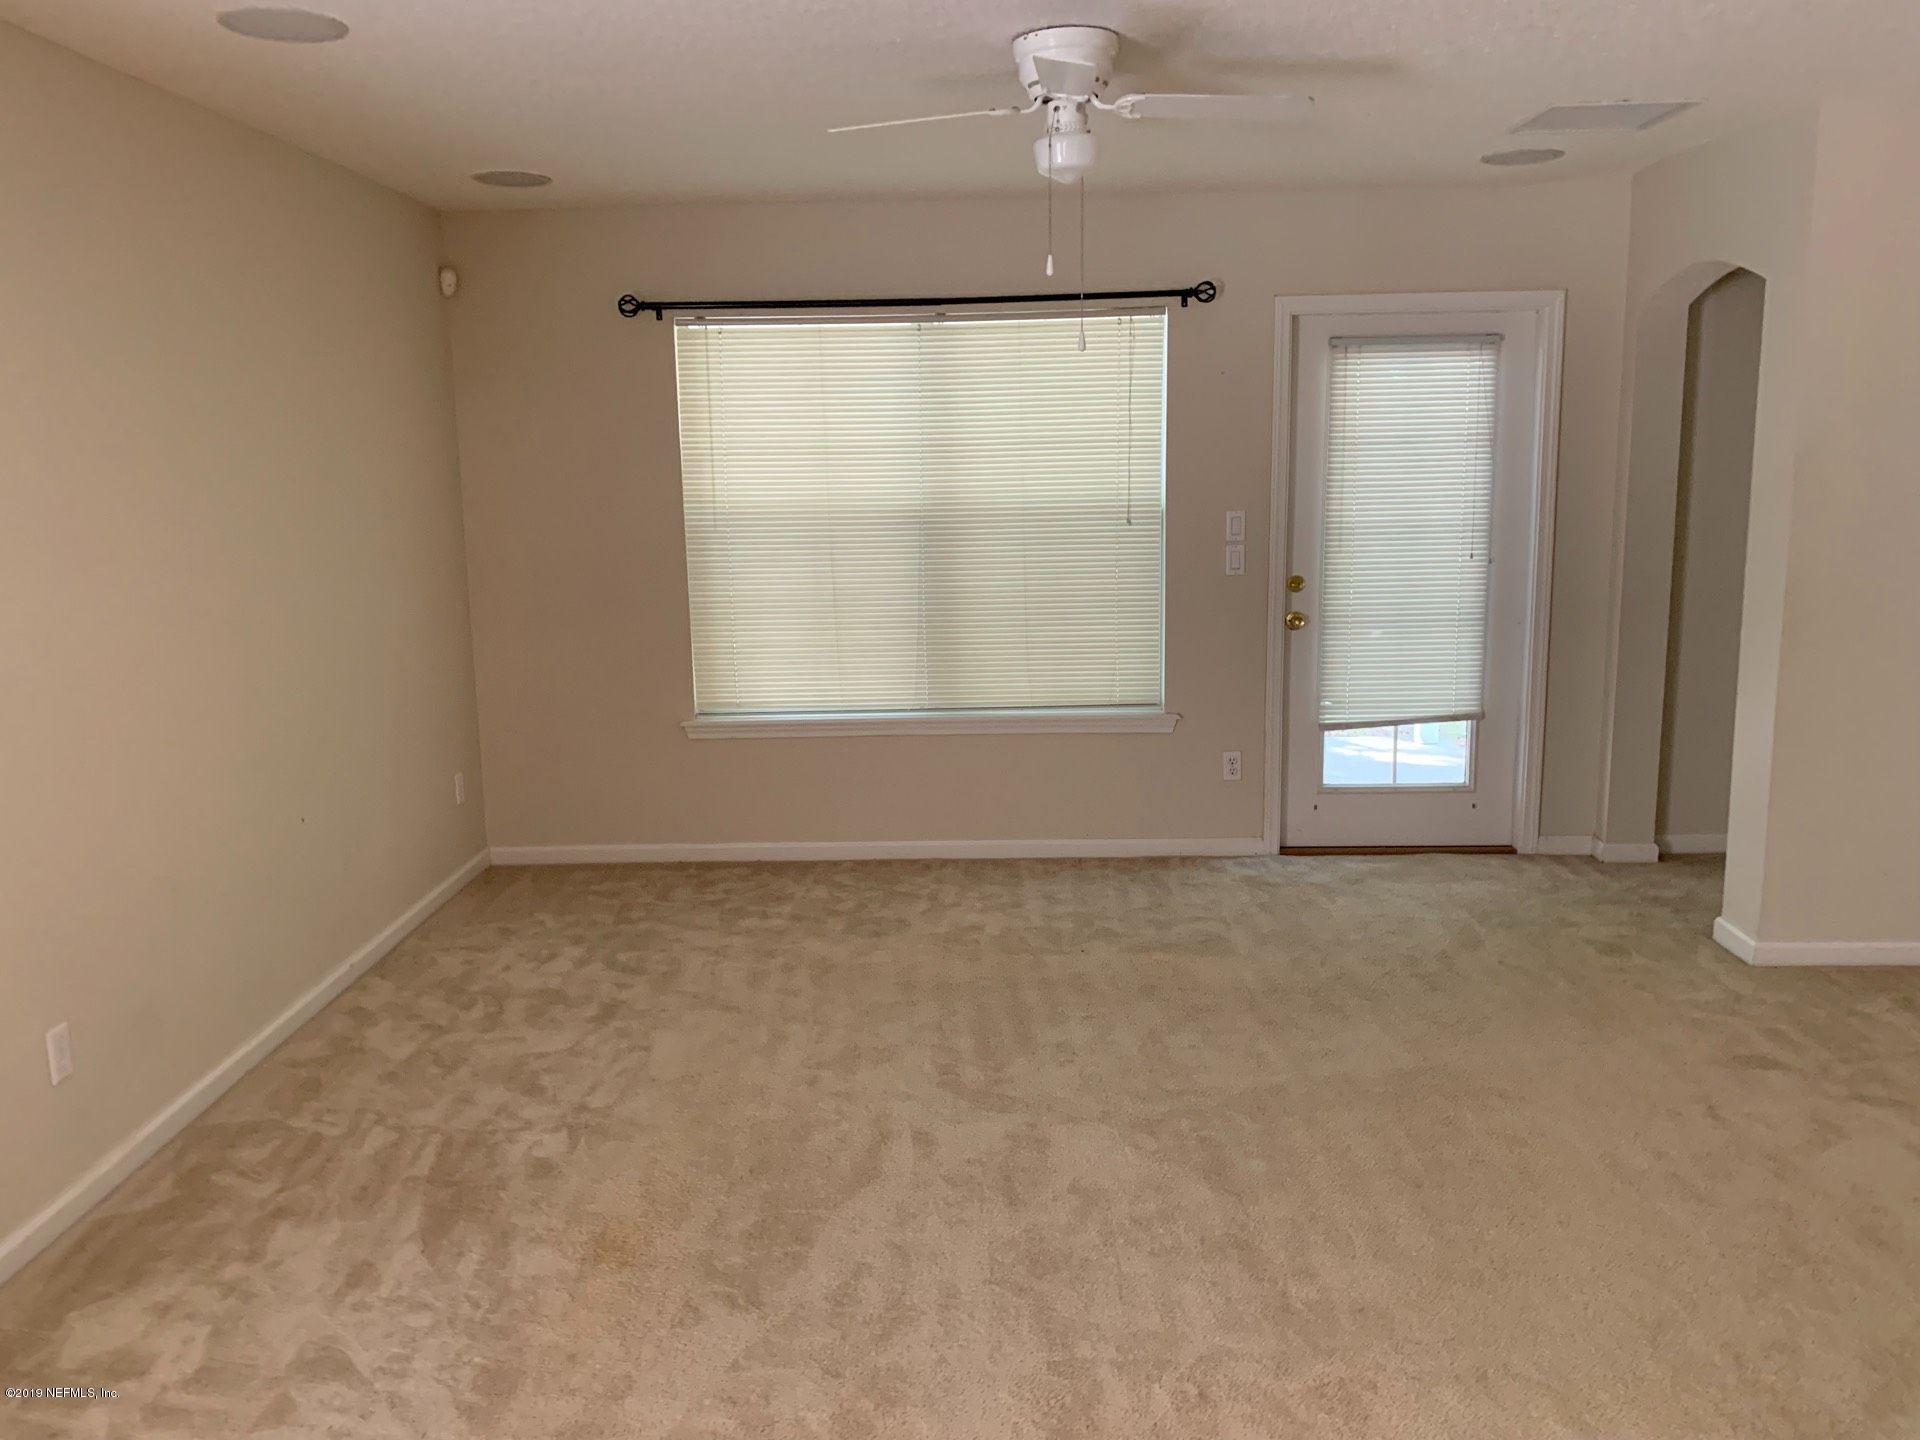 3850 PEBBLE BROOKE, ORANGE PARK, FLORIDA 32065, 3 Bedrooms Bedrooms, ,2 BathroomsBathrooms,Rental,For sale,PEBBLE BROOKE,1030115